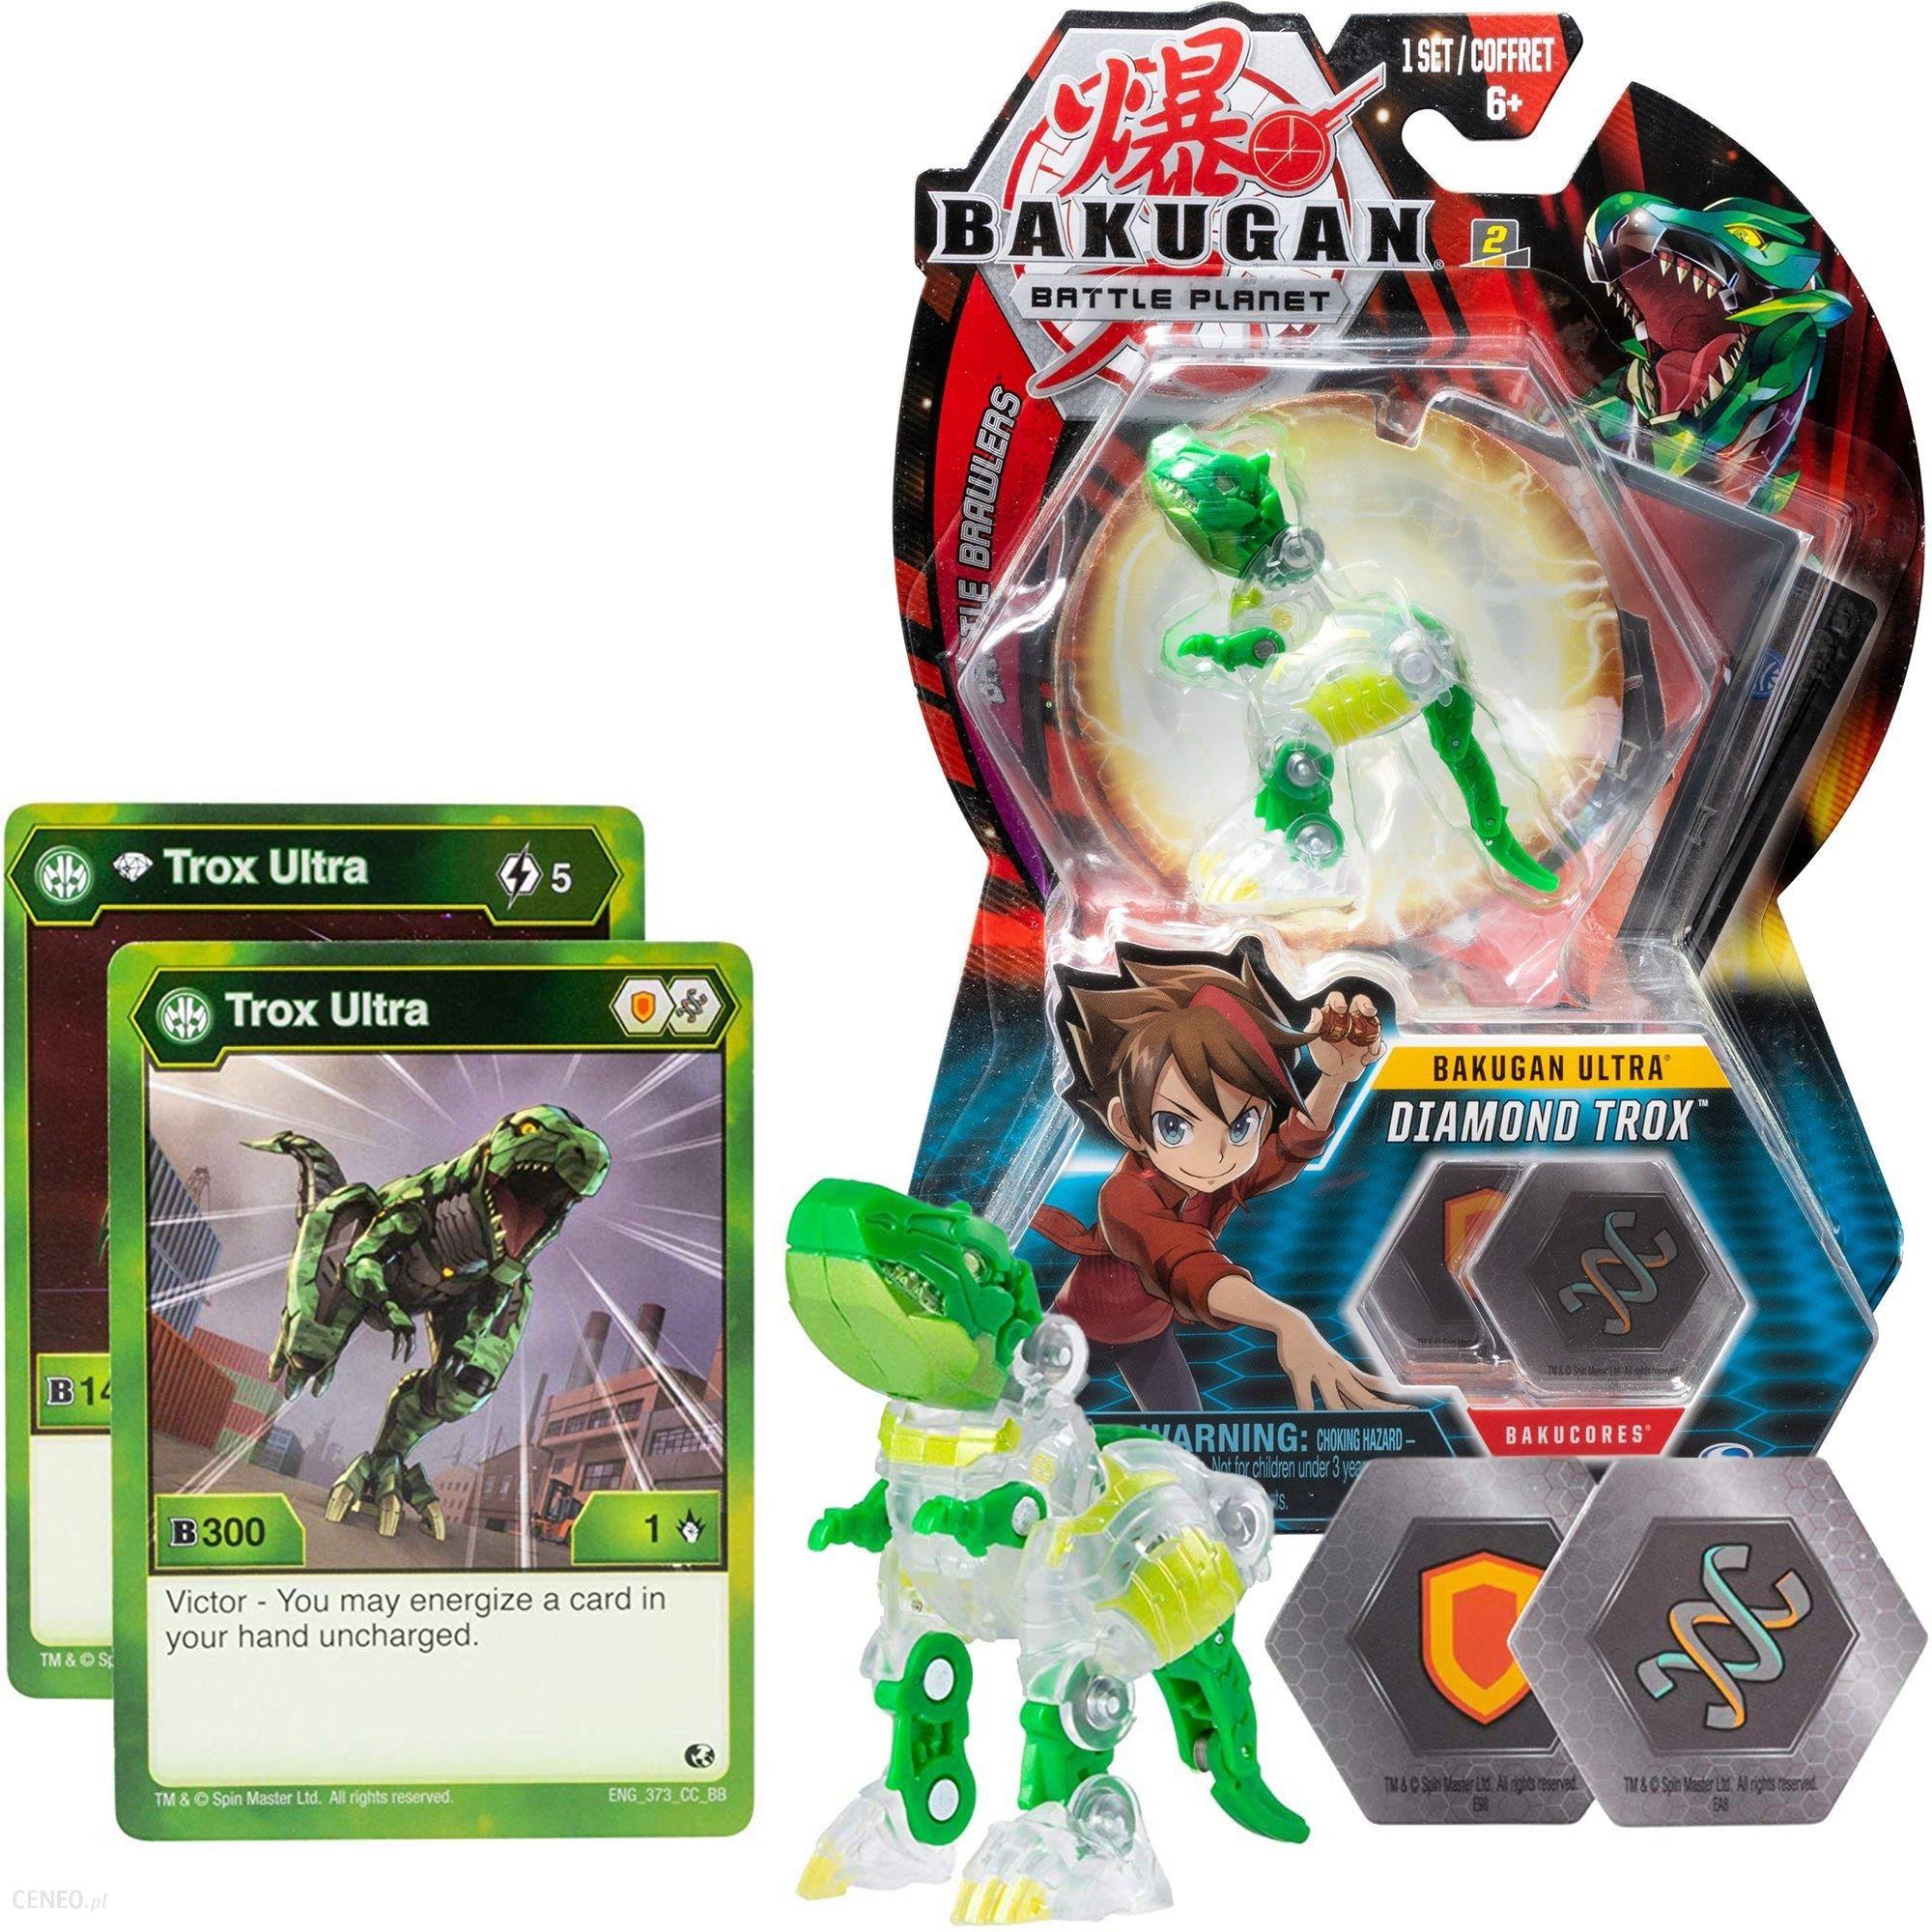 BAKUGAN ULTRA Battle Planet Diamond TROX New